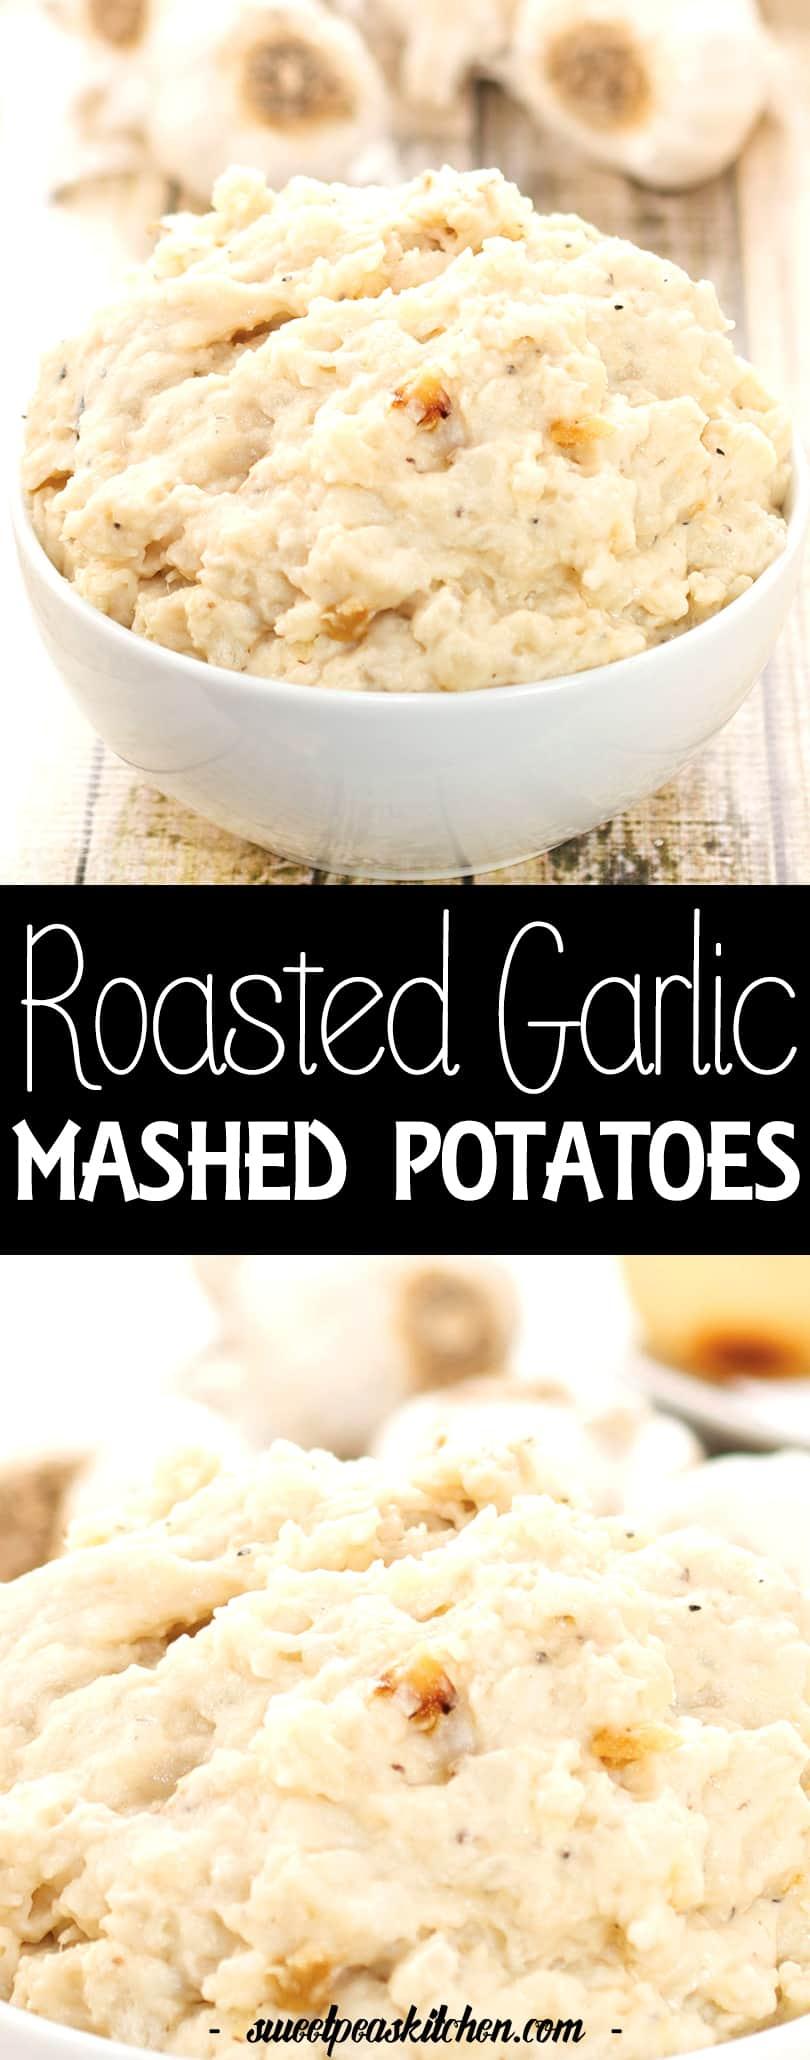 Homemade roasted garlic mashed potatoes Recipe